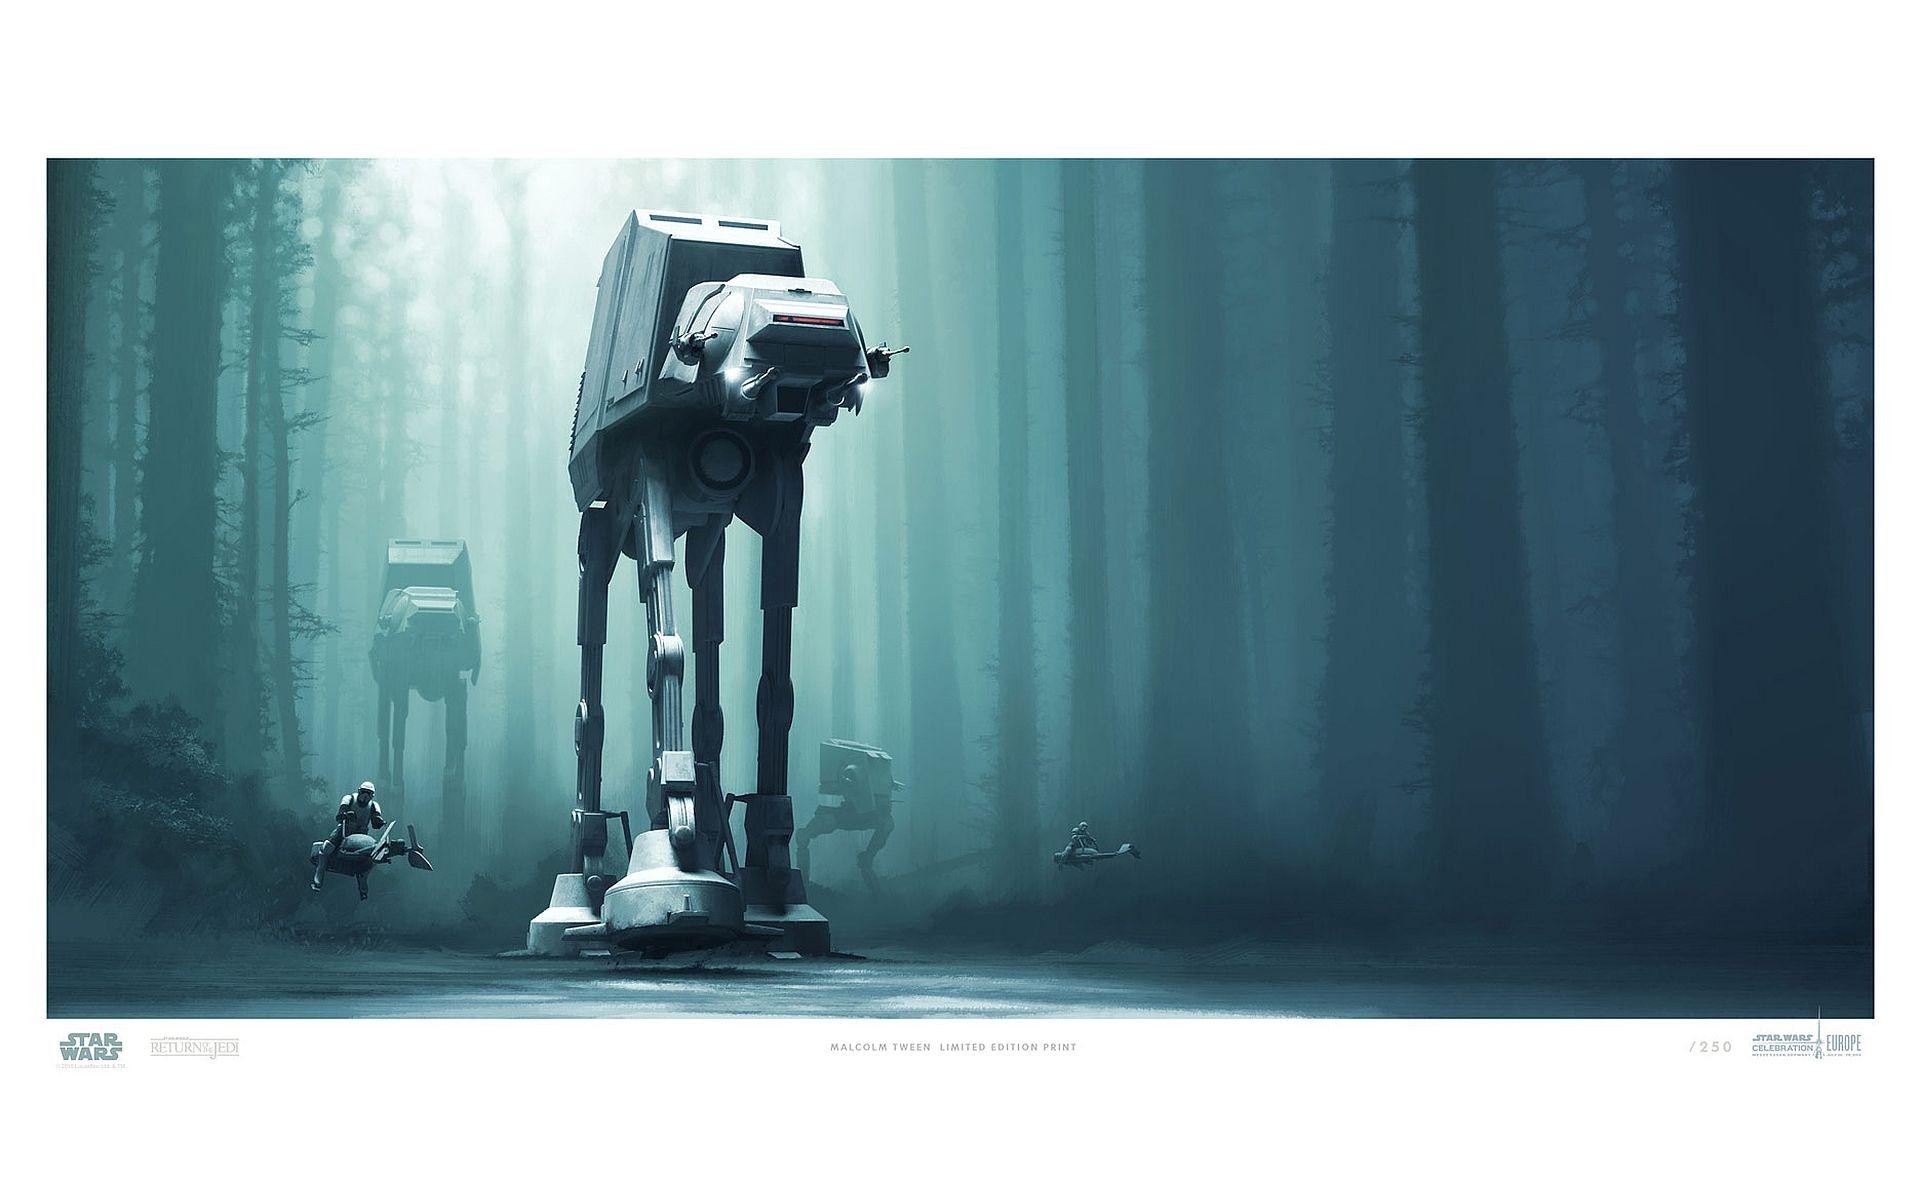 Star Wars Wallpaper Dump - Album on Imgur